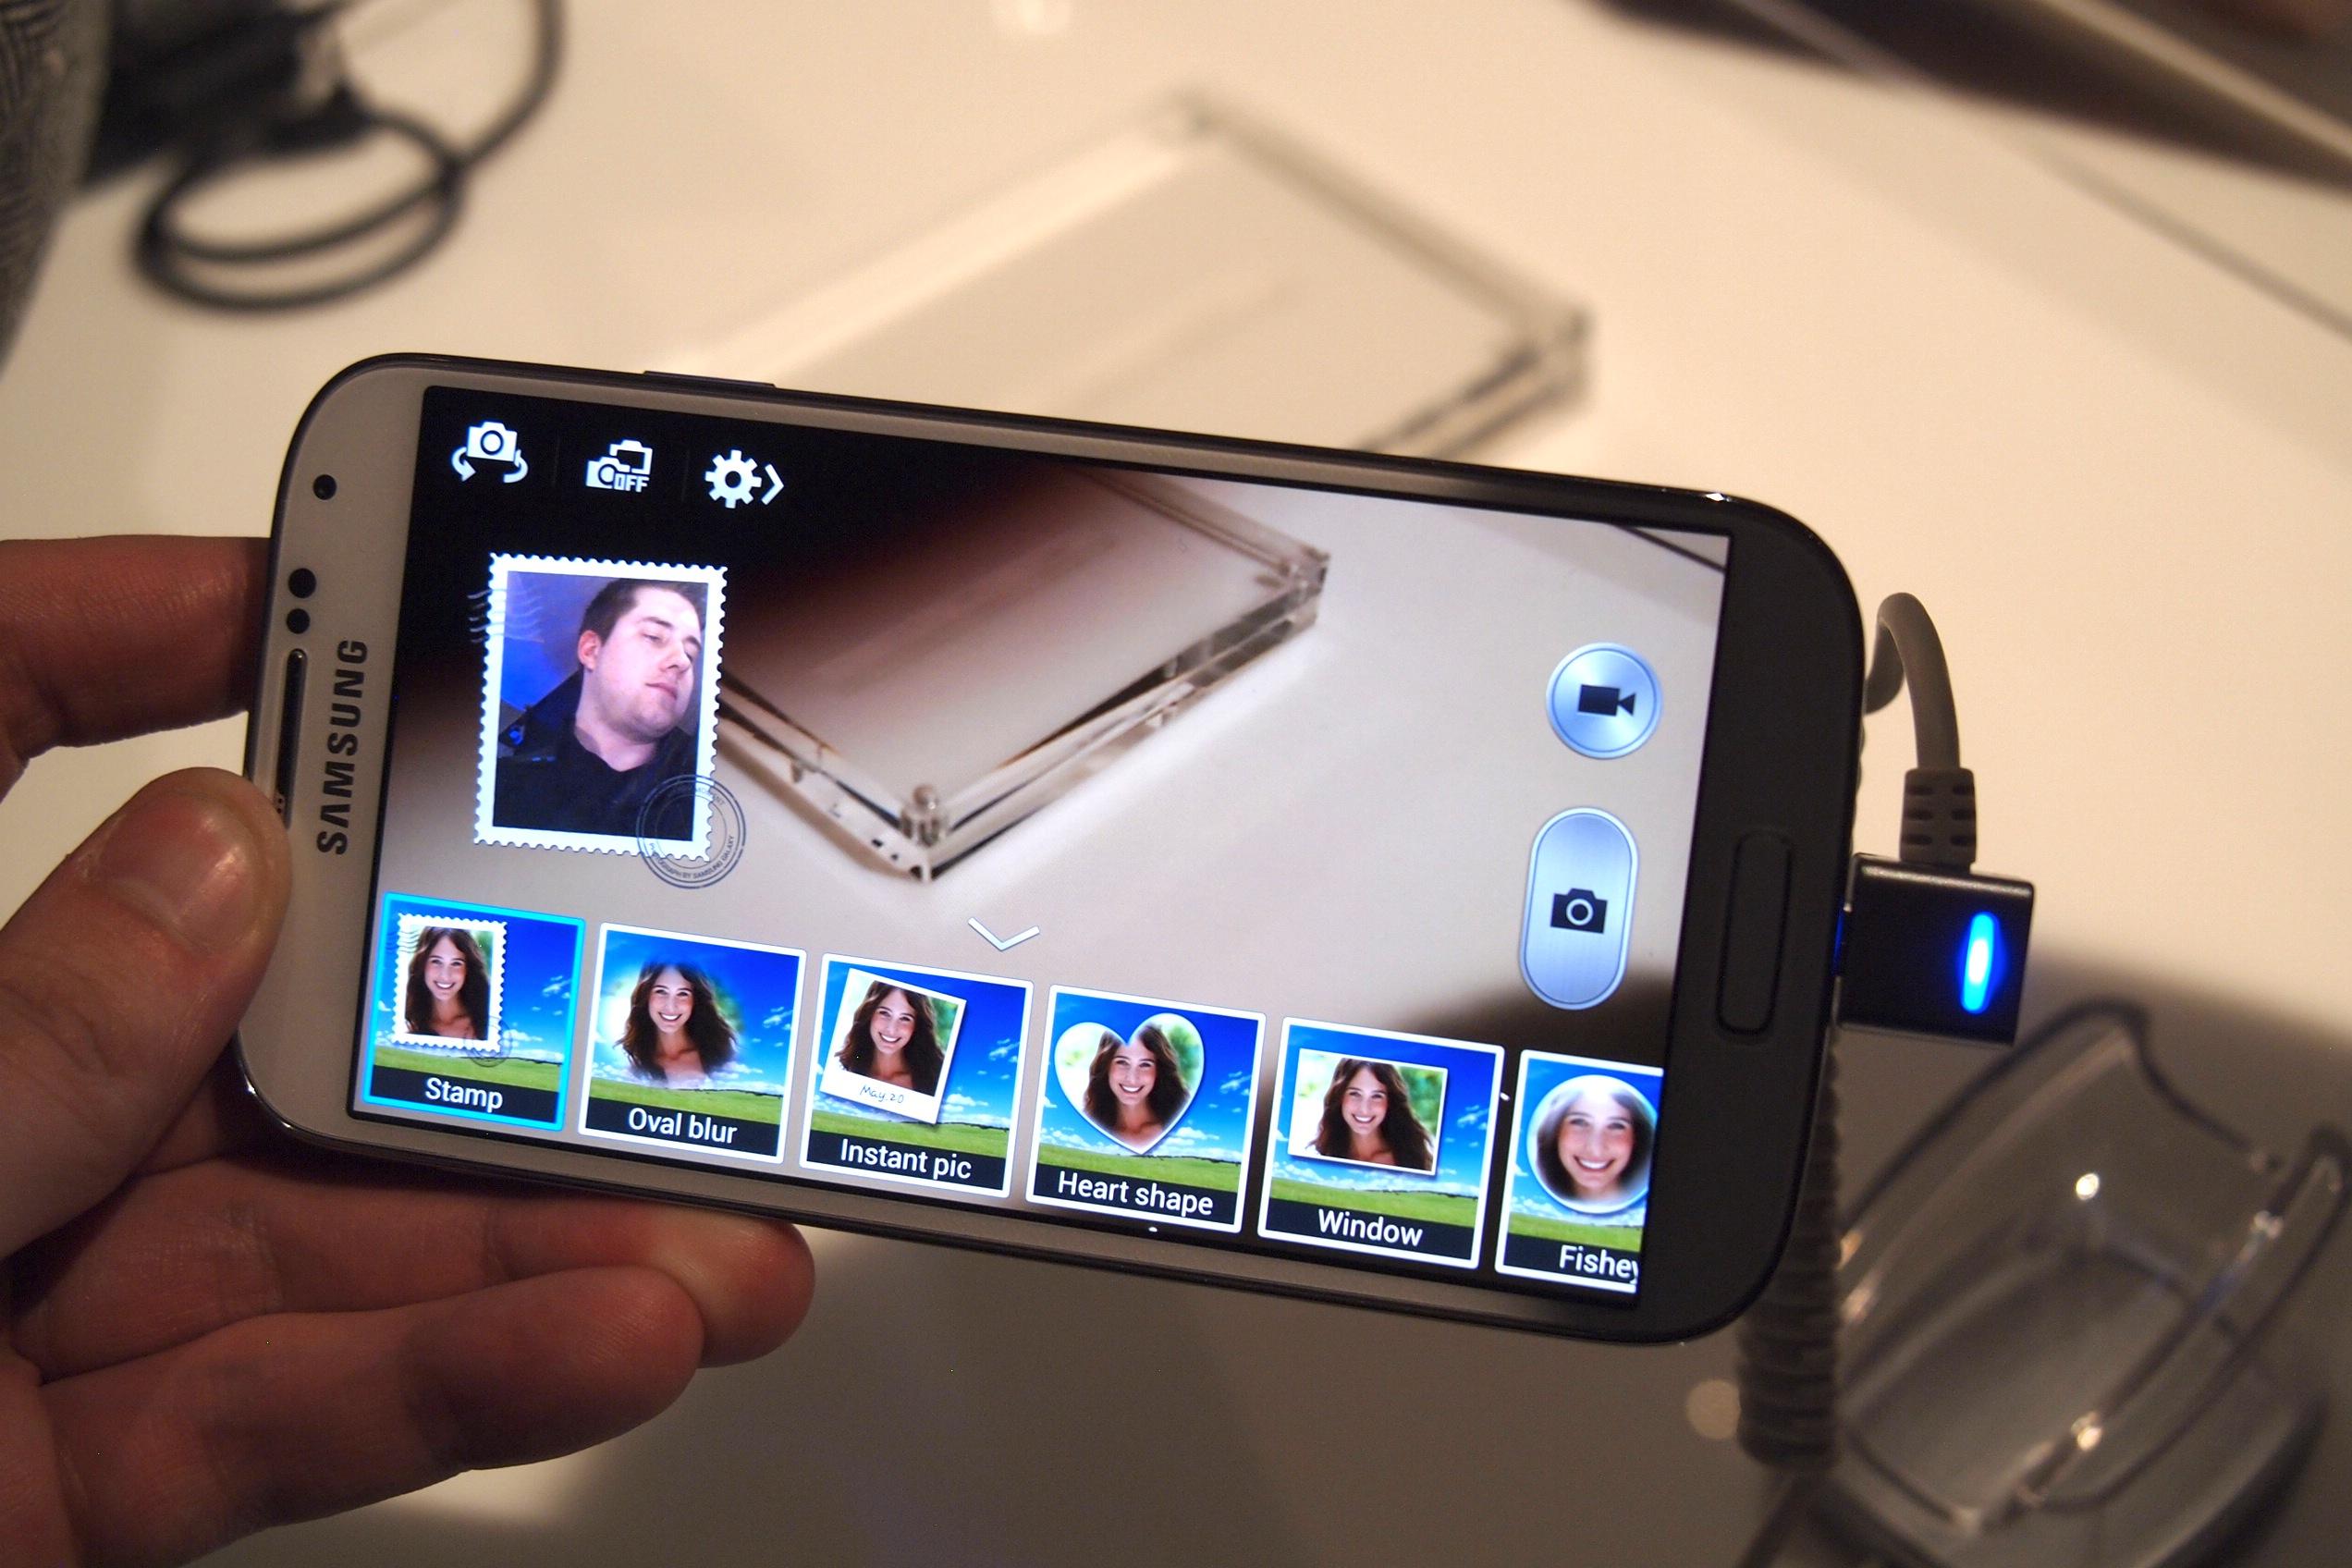 Galaxy-S4-dual-camera